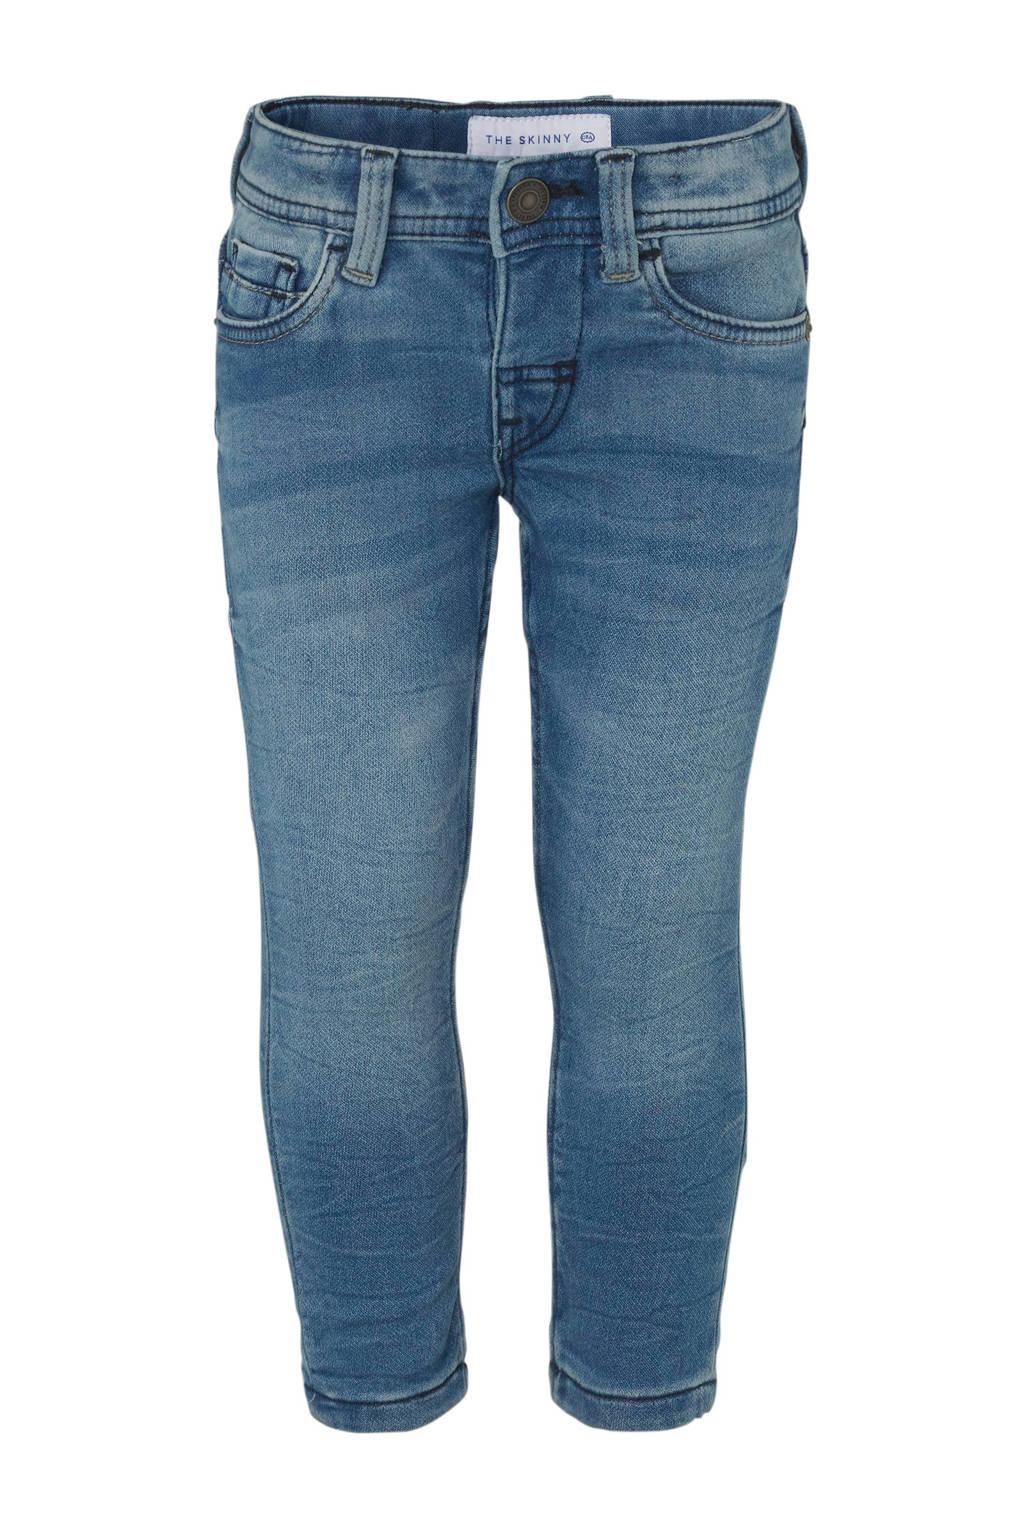 C&A Palomino skinny jeans, Light denim